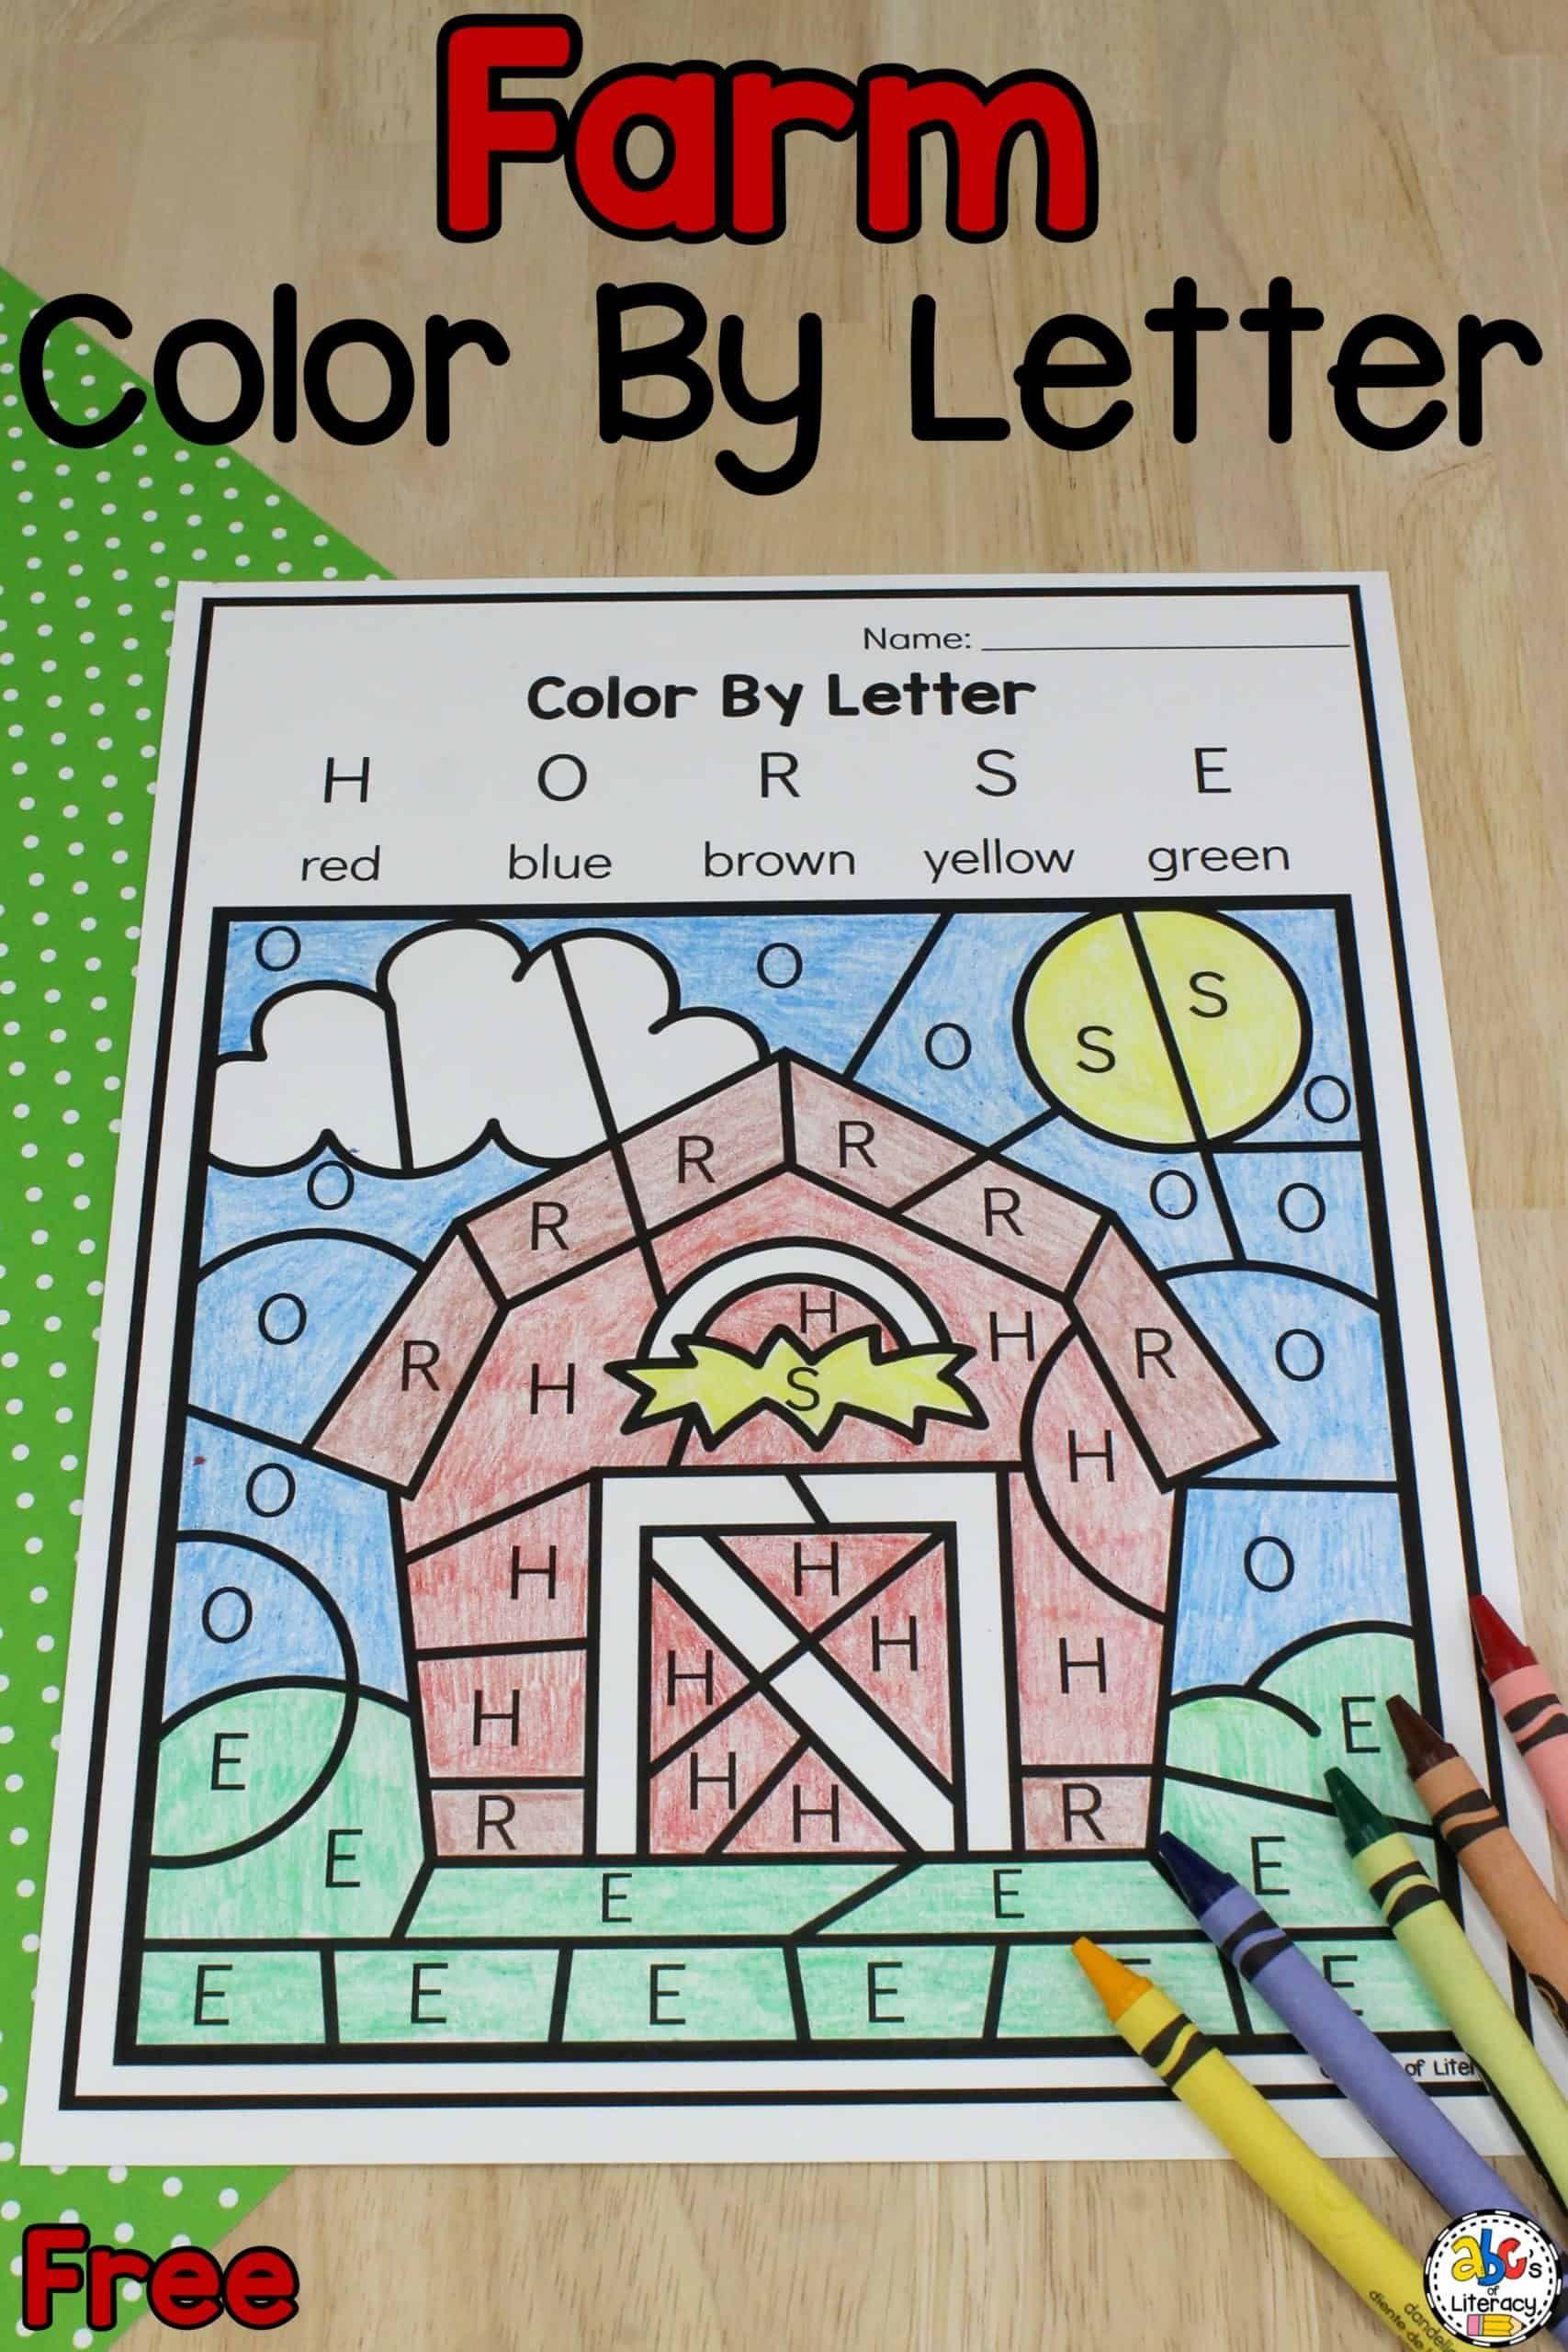 Barn Color By Letter Worksheet In